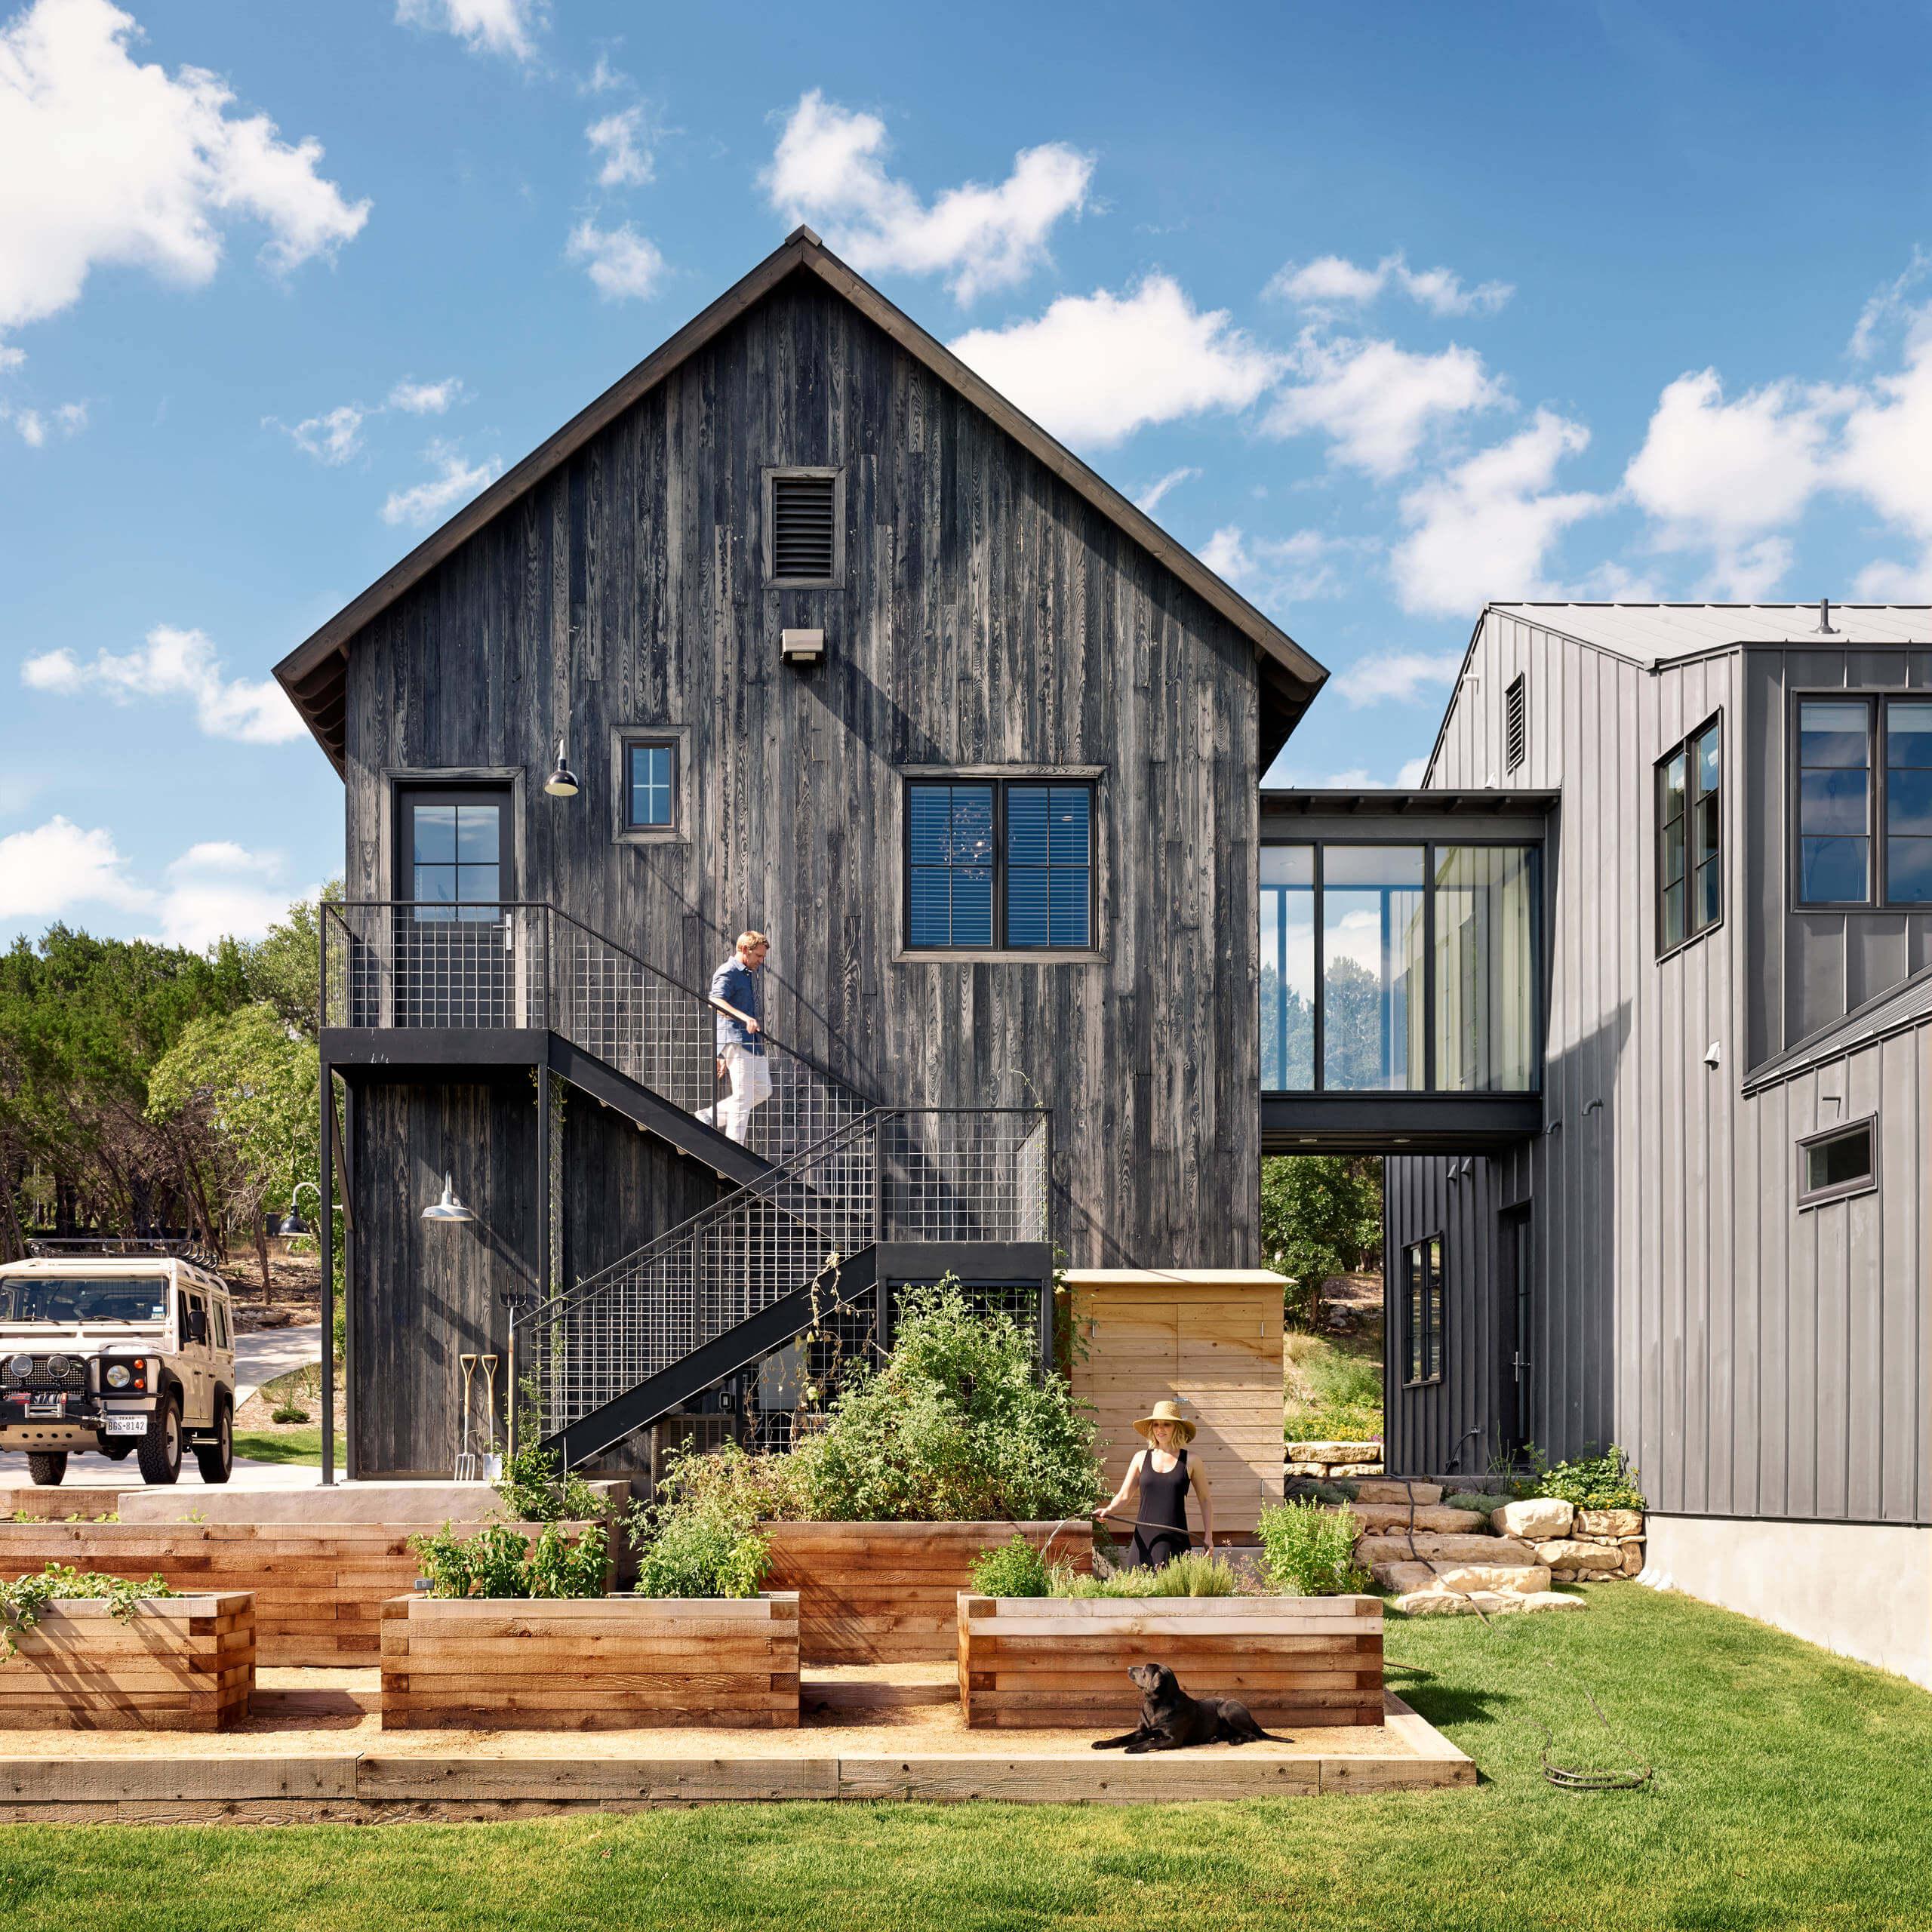 farmhouse-shiflet-group-architects-08